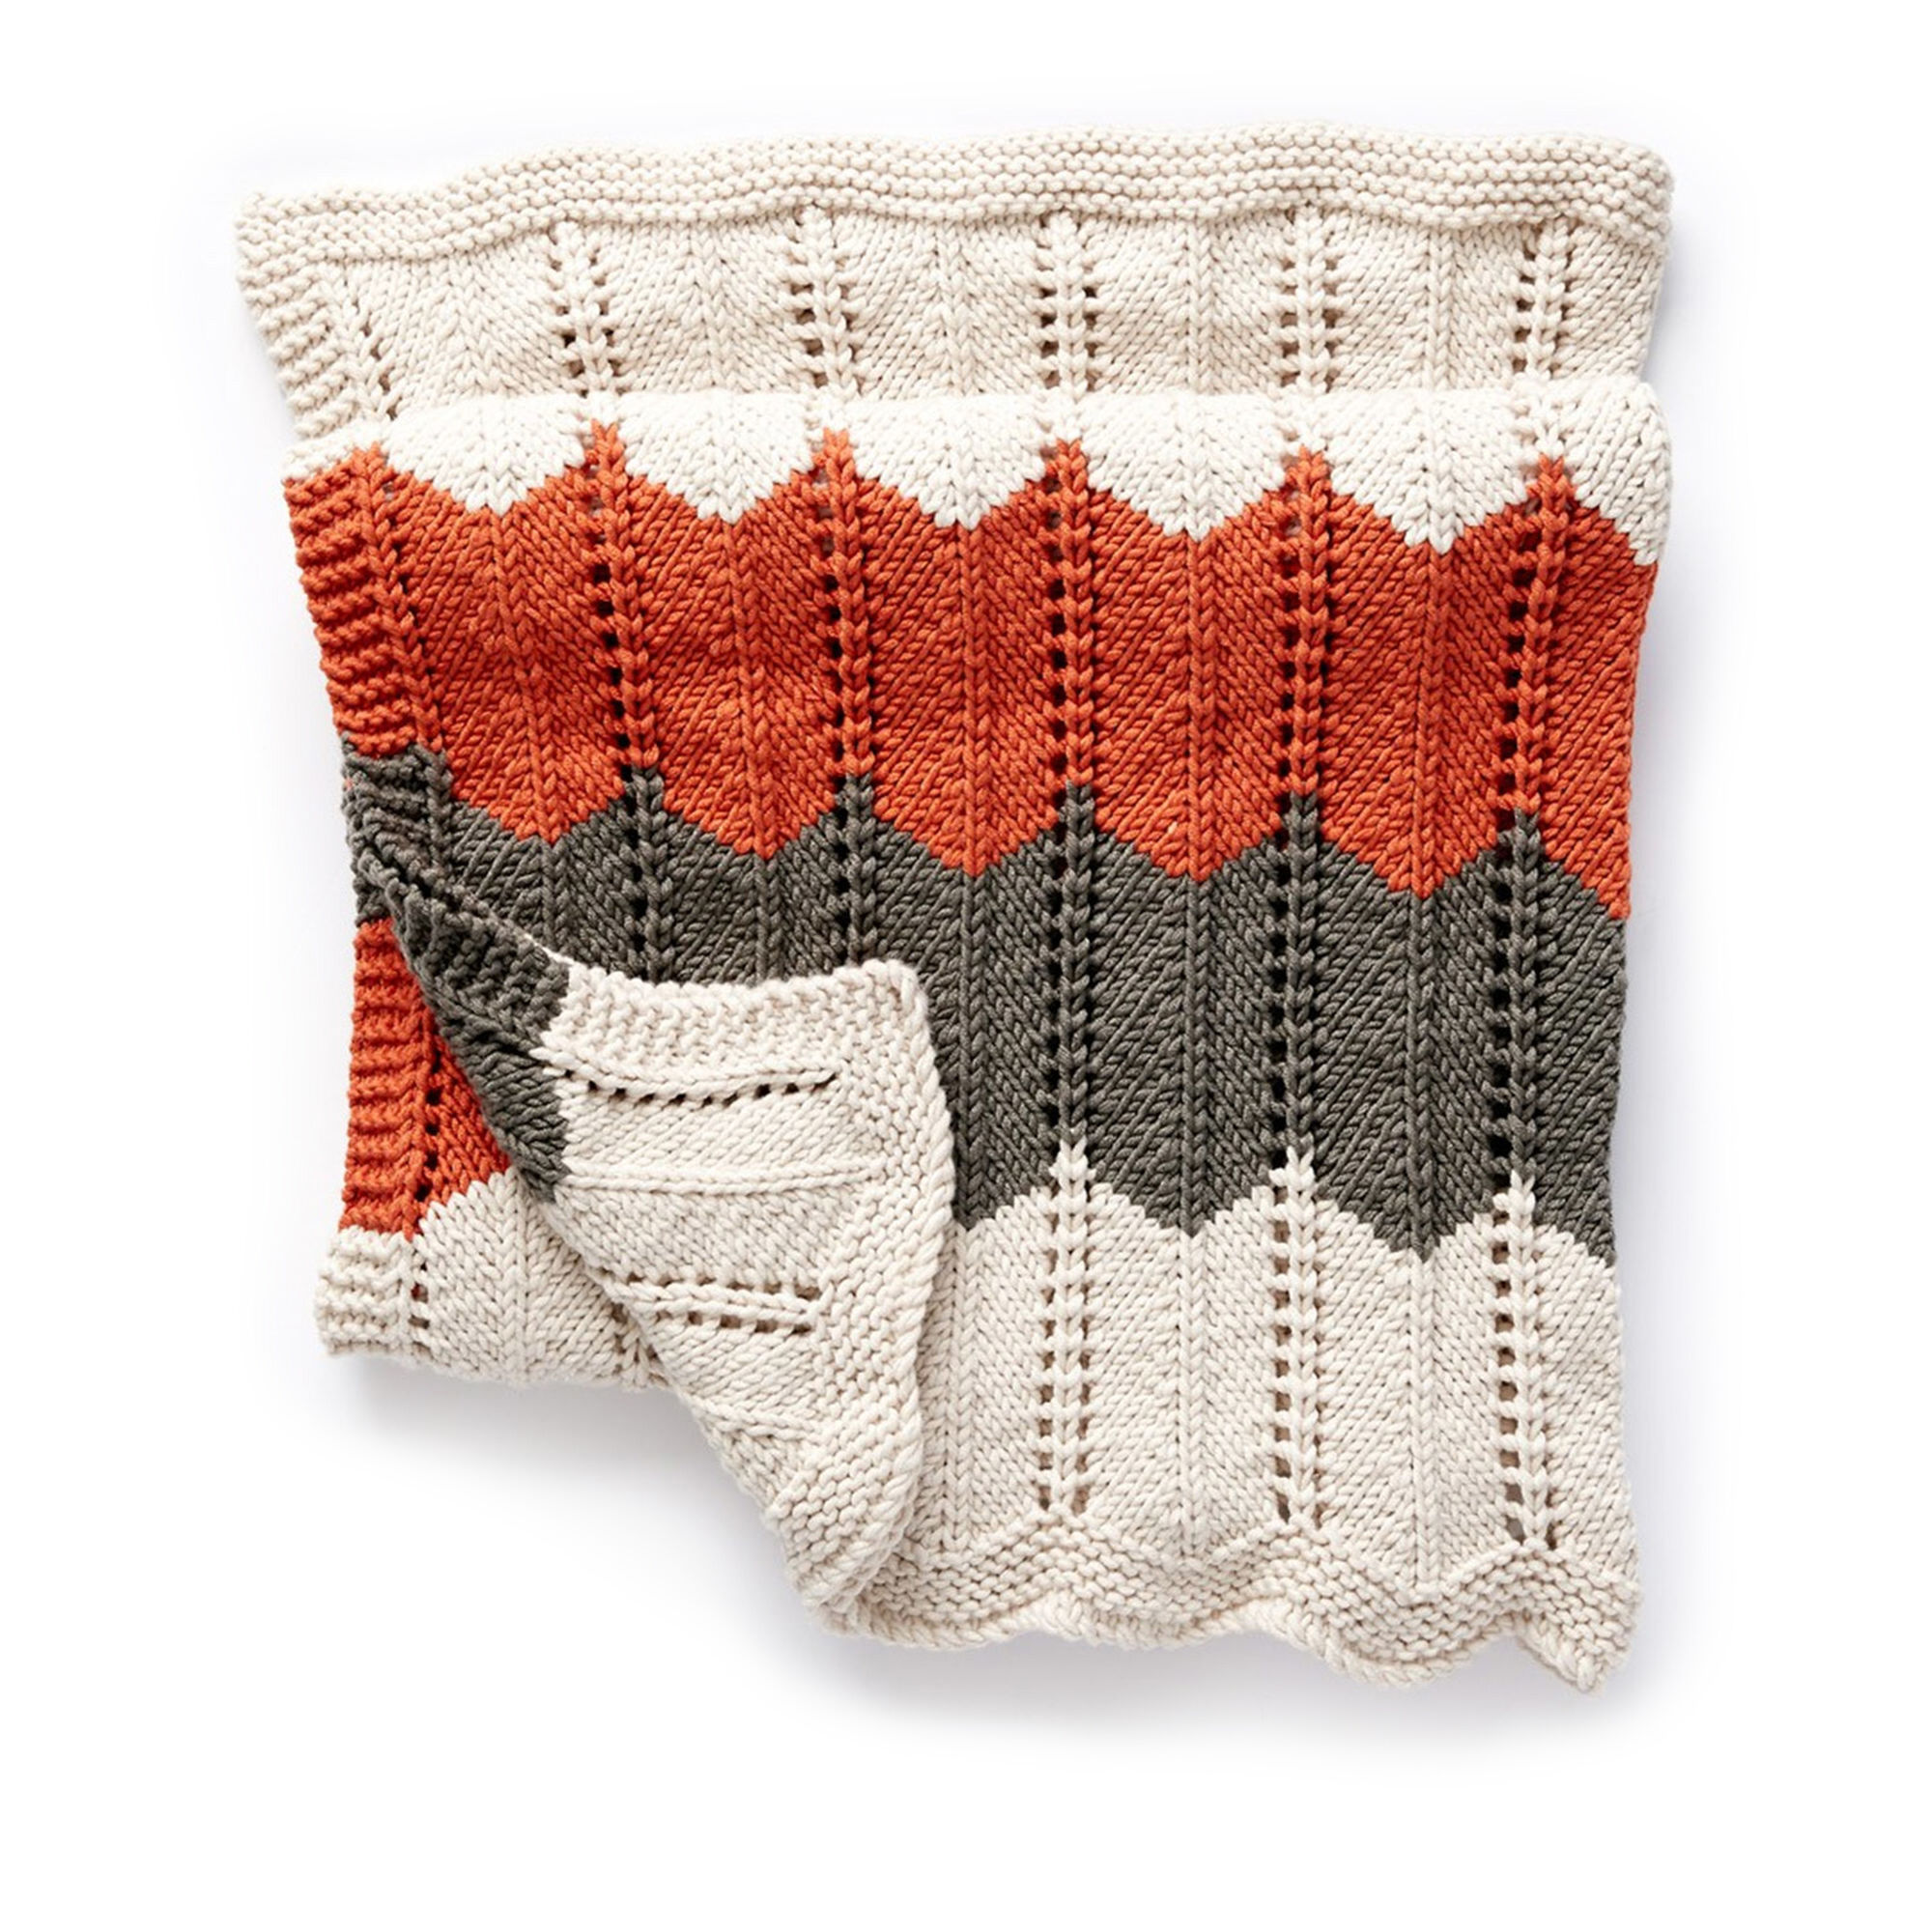 Bernat Ripple And Ridge Knit Blanket Yarnspirations